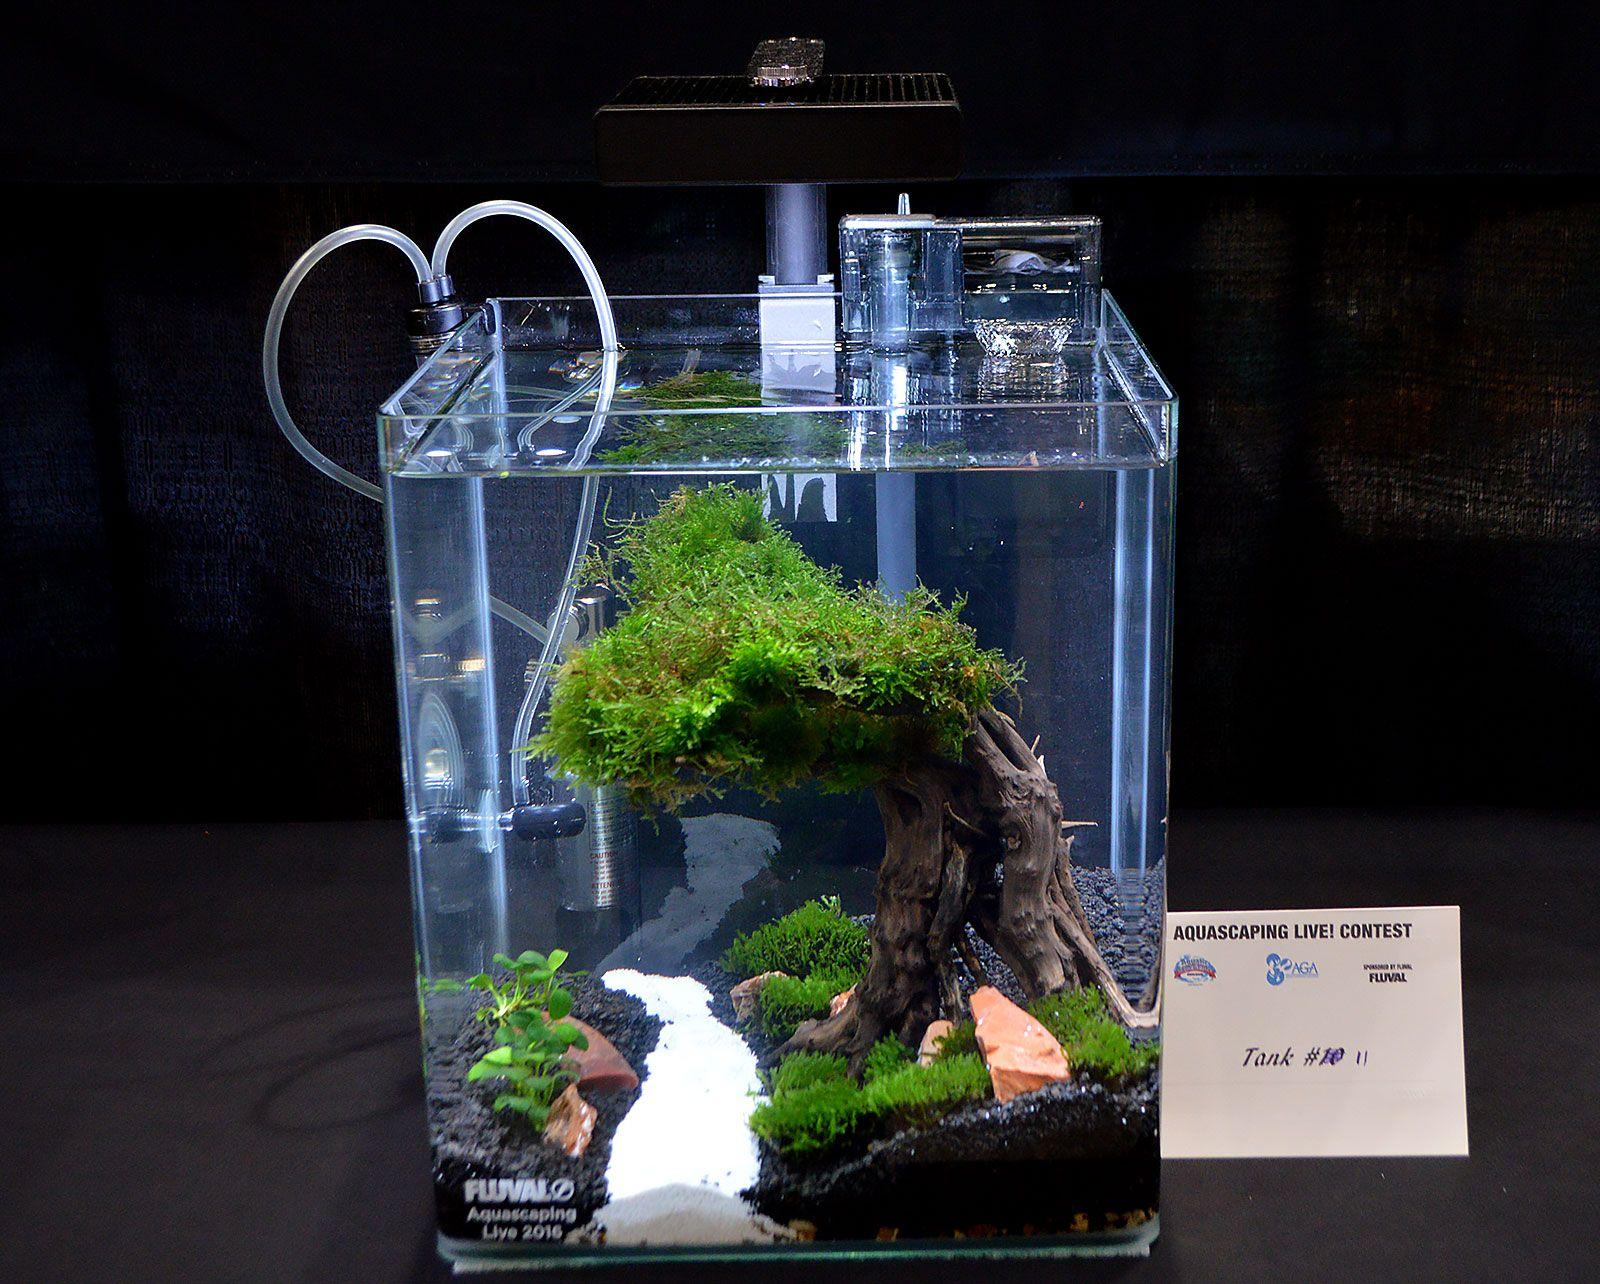 Aga Aquascaping Live 2016 Small Tank Entry 11 Aquascape Fish Tank Plants Betta Fish Care